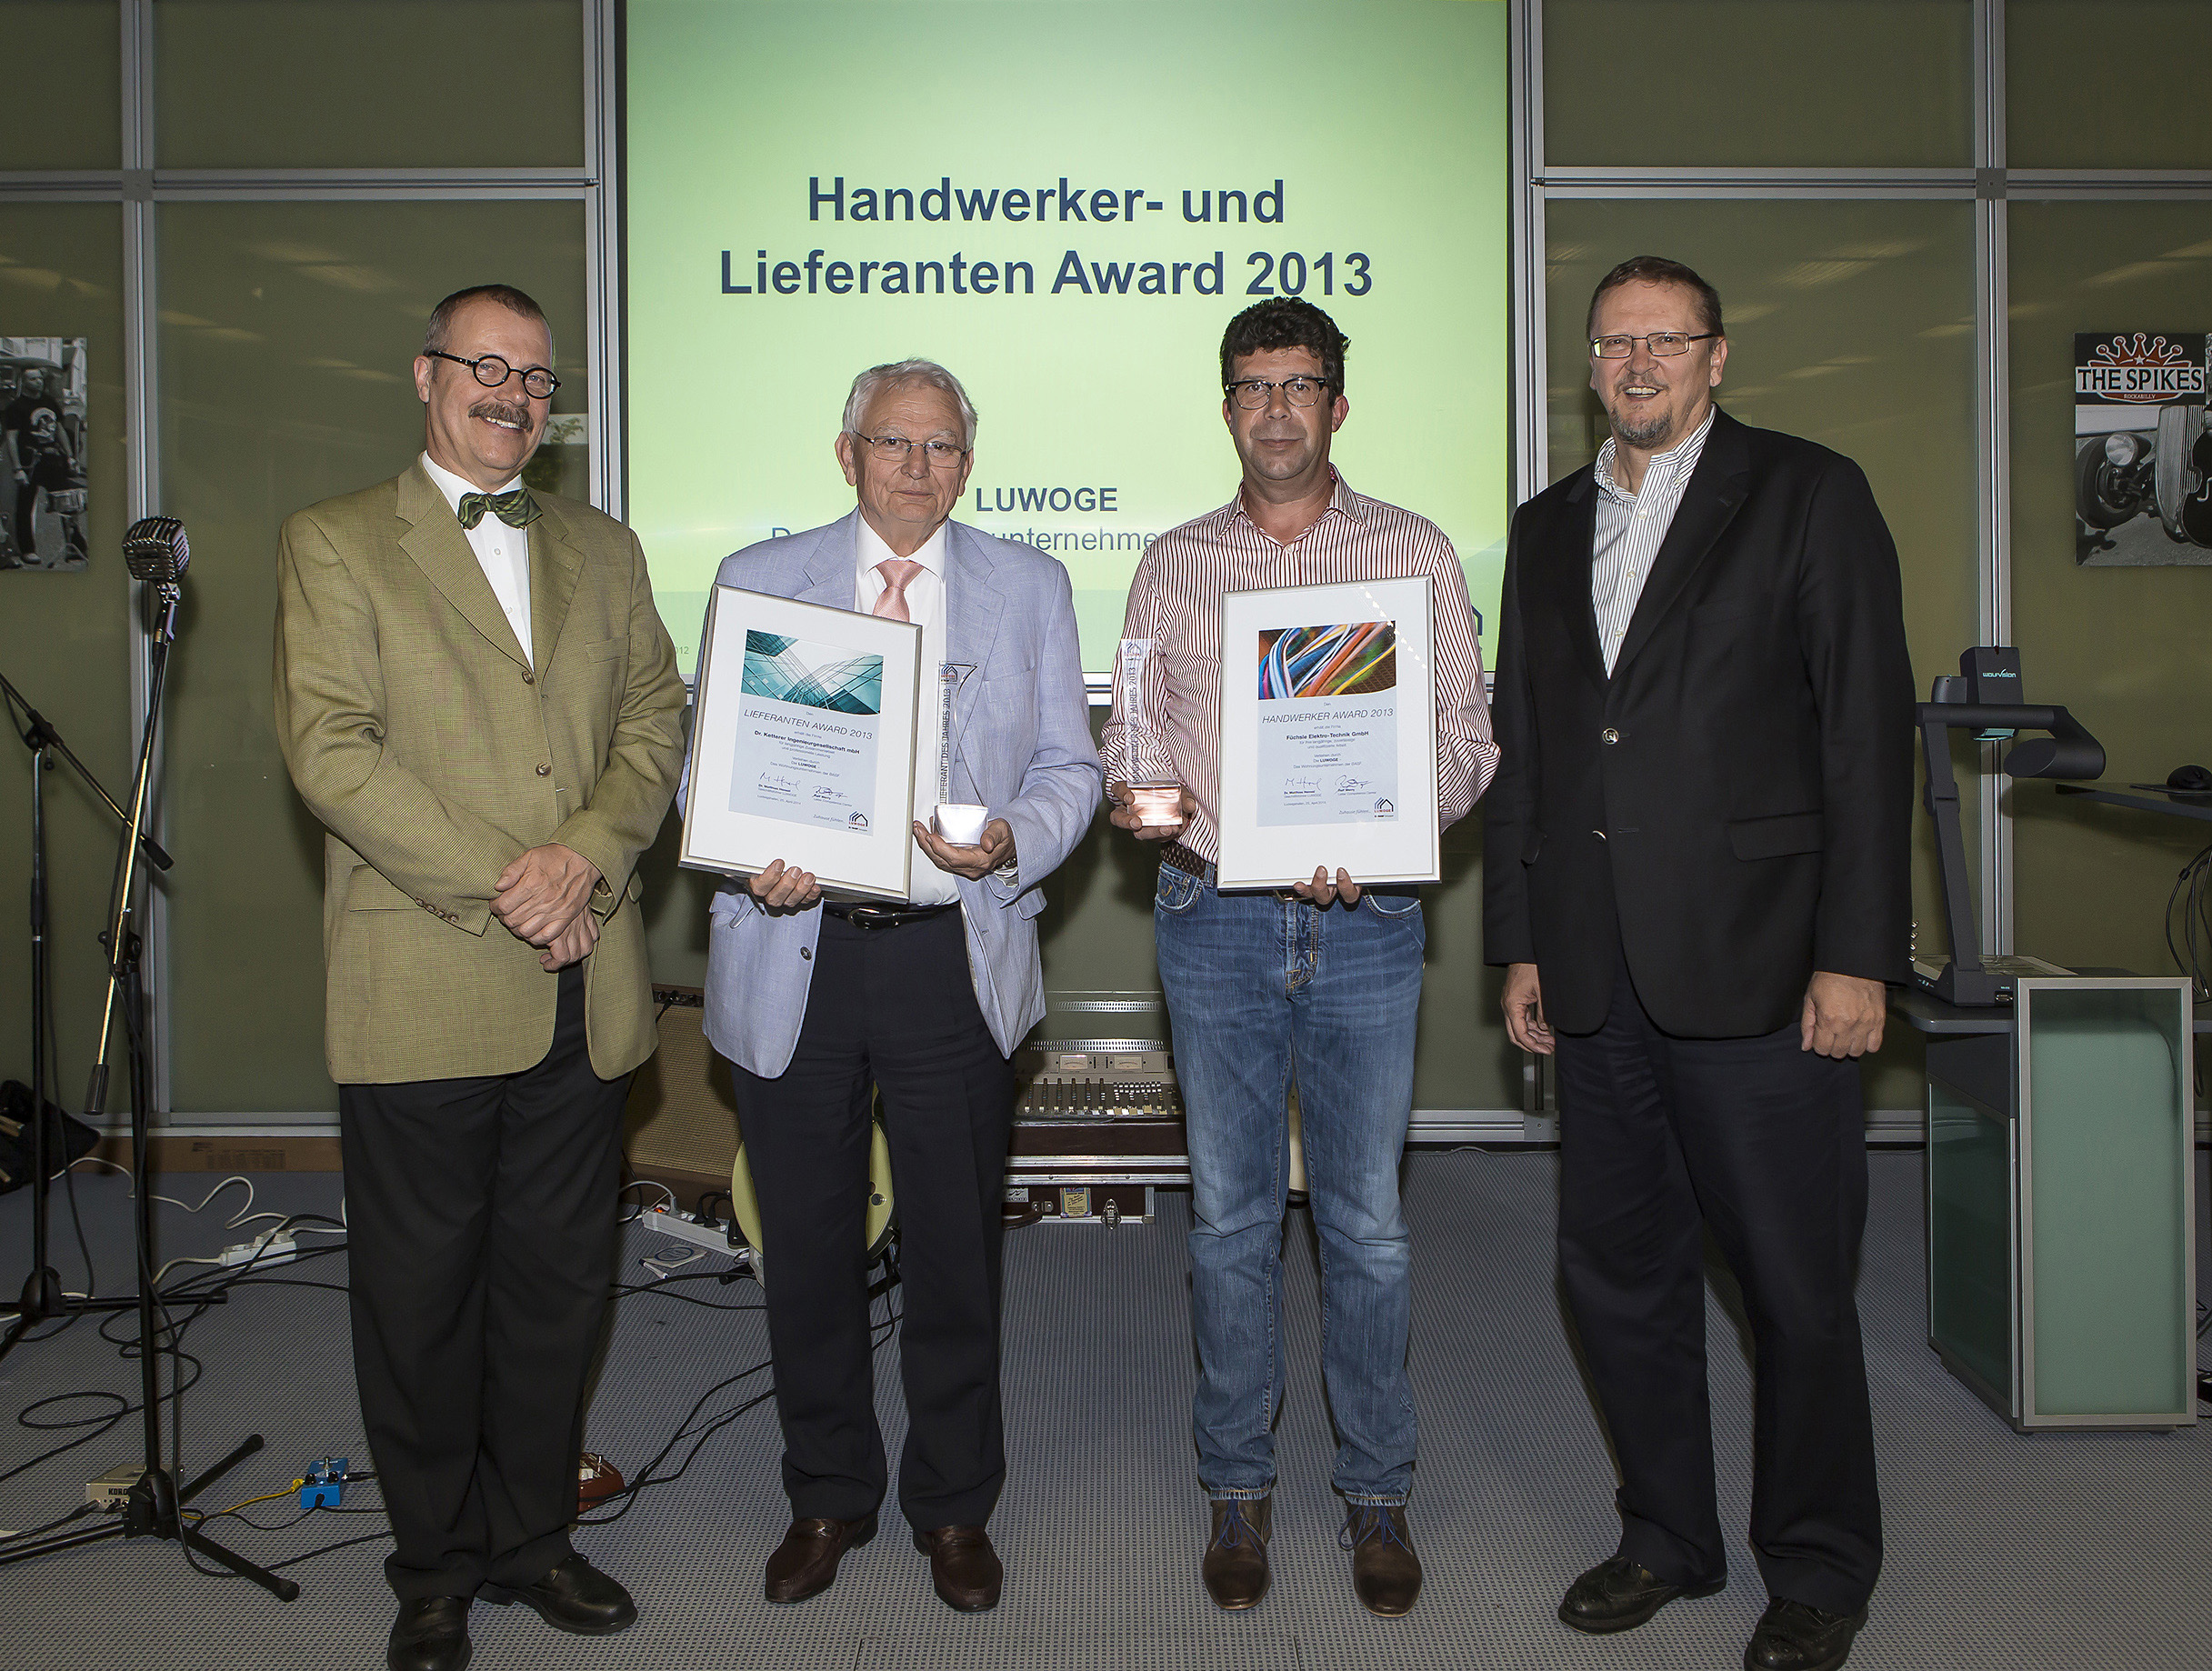 Ludwigshafen luwoge verleiht award an ingenieurb ro dr ketterer und f chsle elektro technik - Ingenieurburo ludwigshafen ...